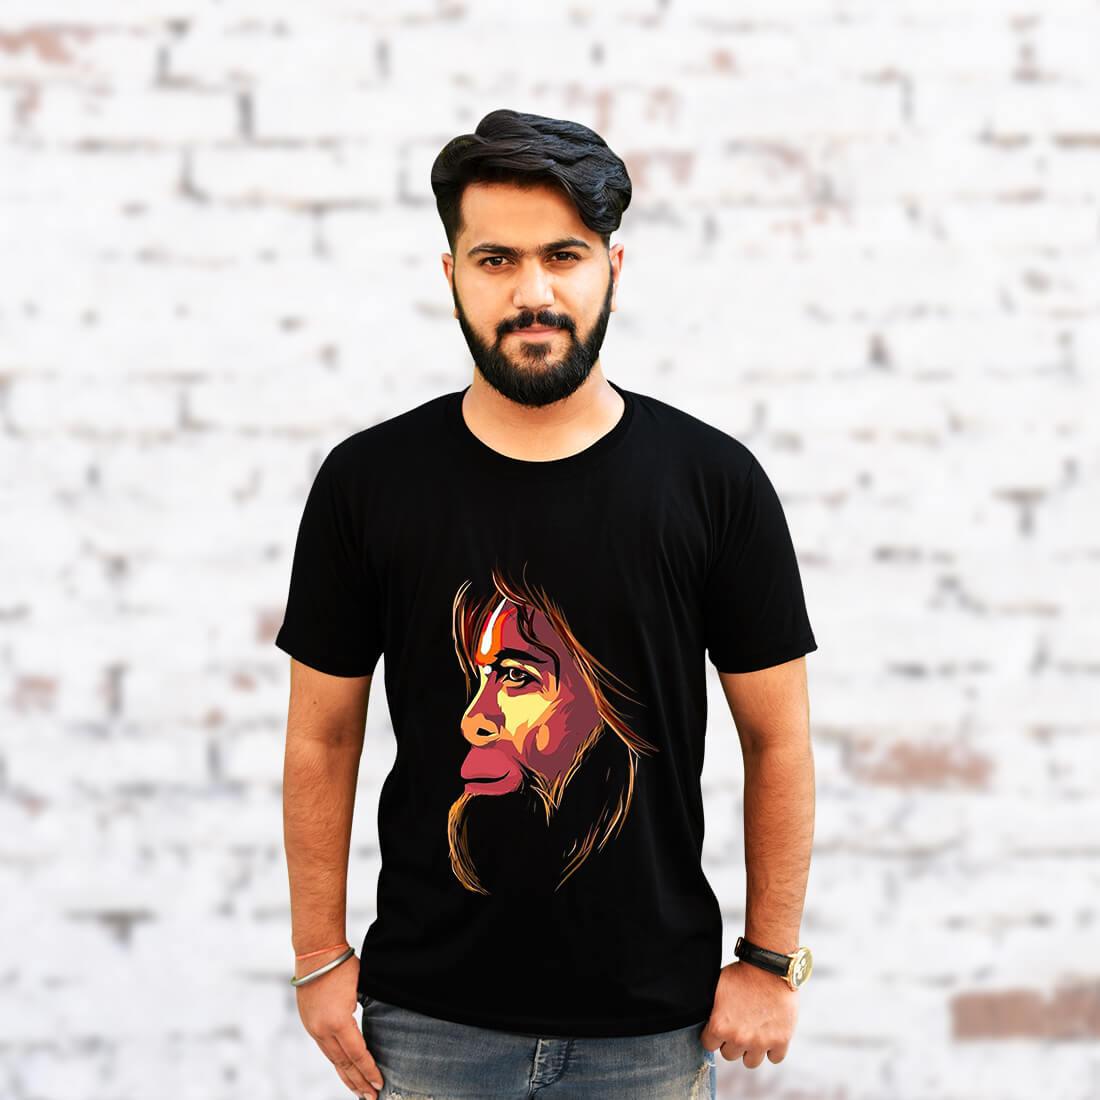 Monkey King Printed Black T-Shirt for Men